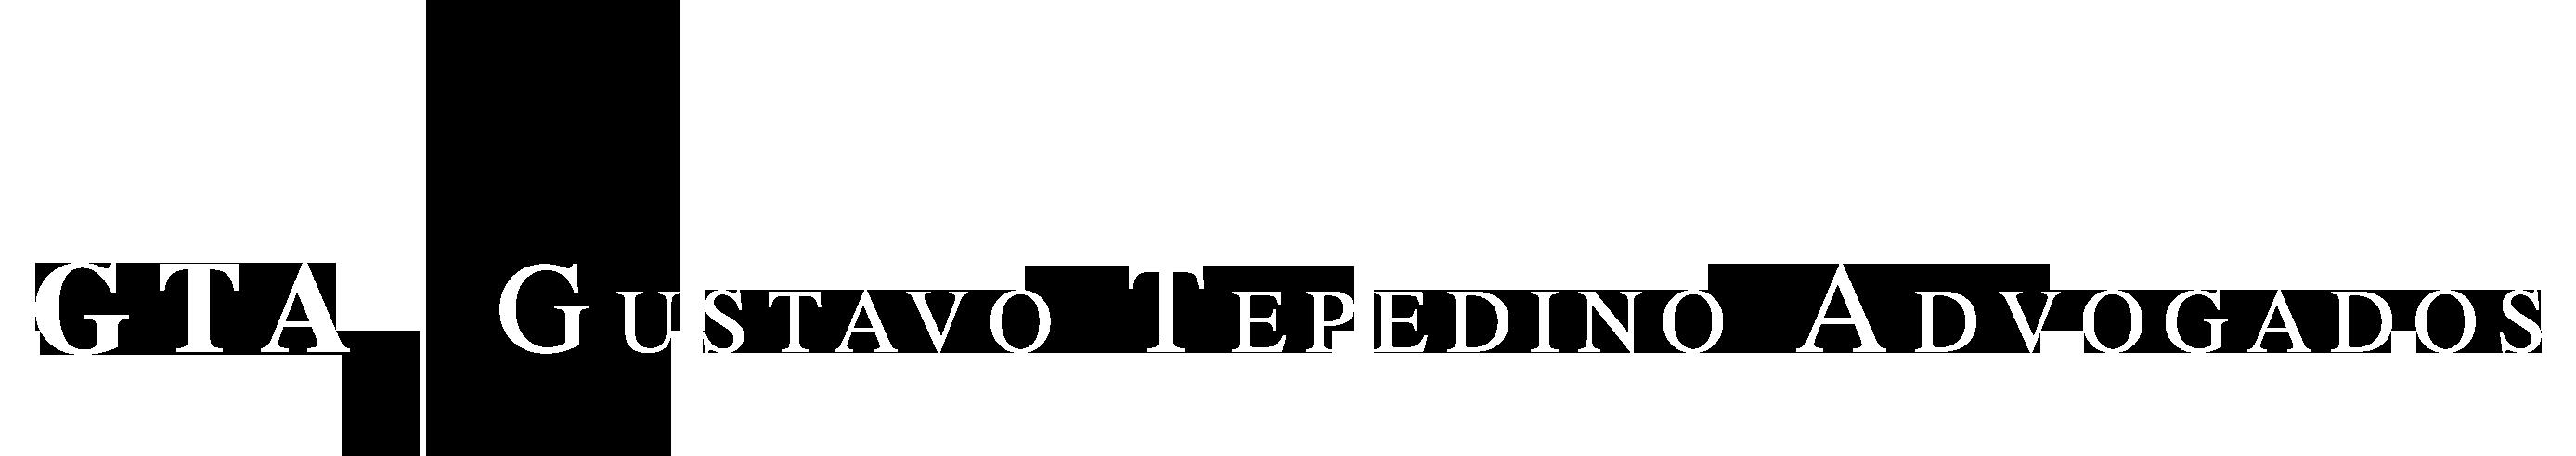 Gustavo Tepedino Advogados